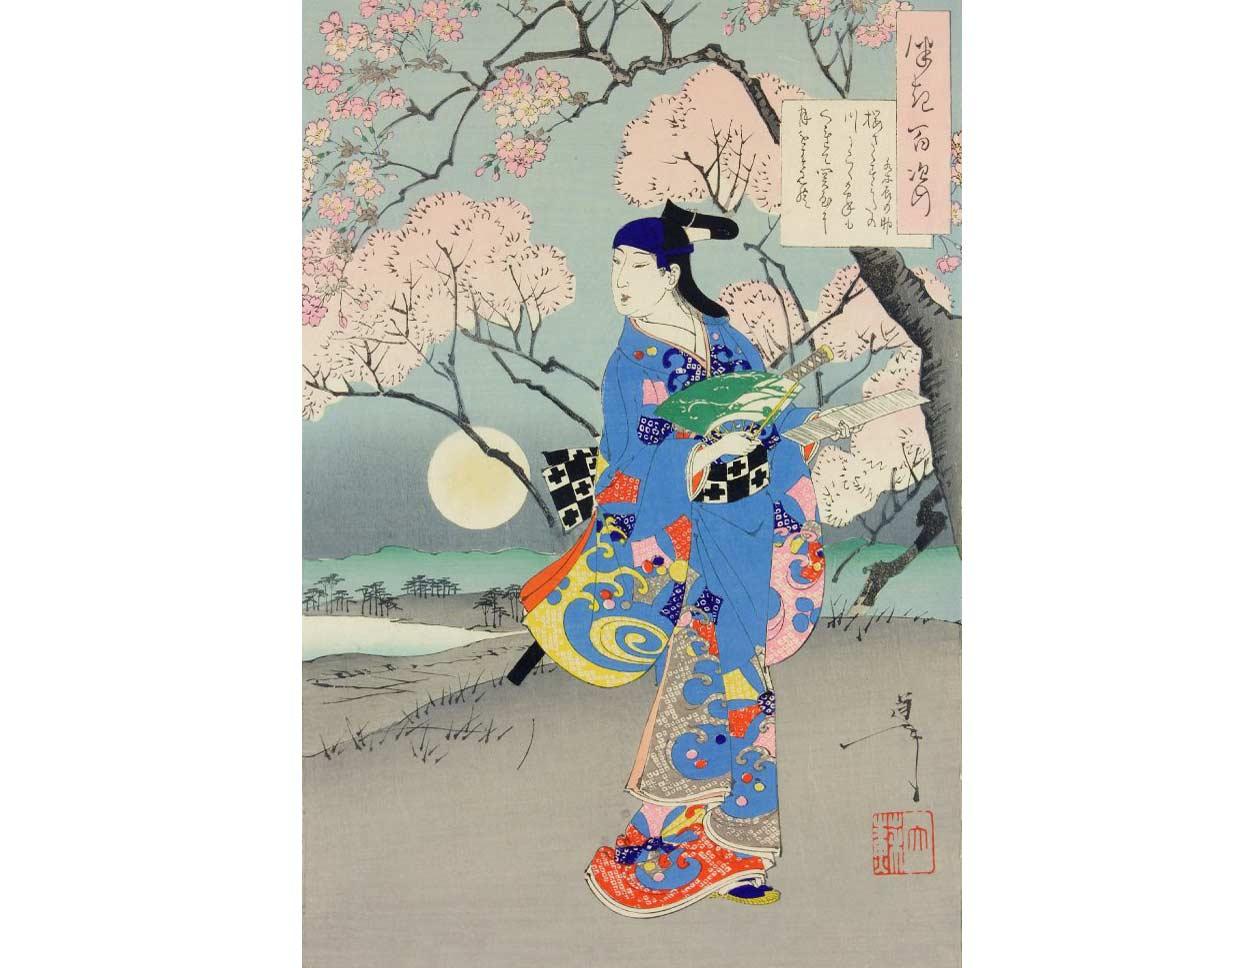 Actor and Cherry Tree, Woodblock Print by Tsukioka Yoshitoshi, 1891